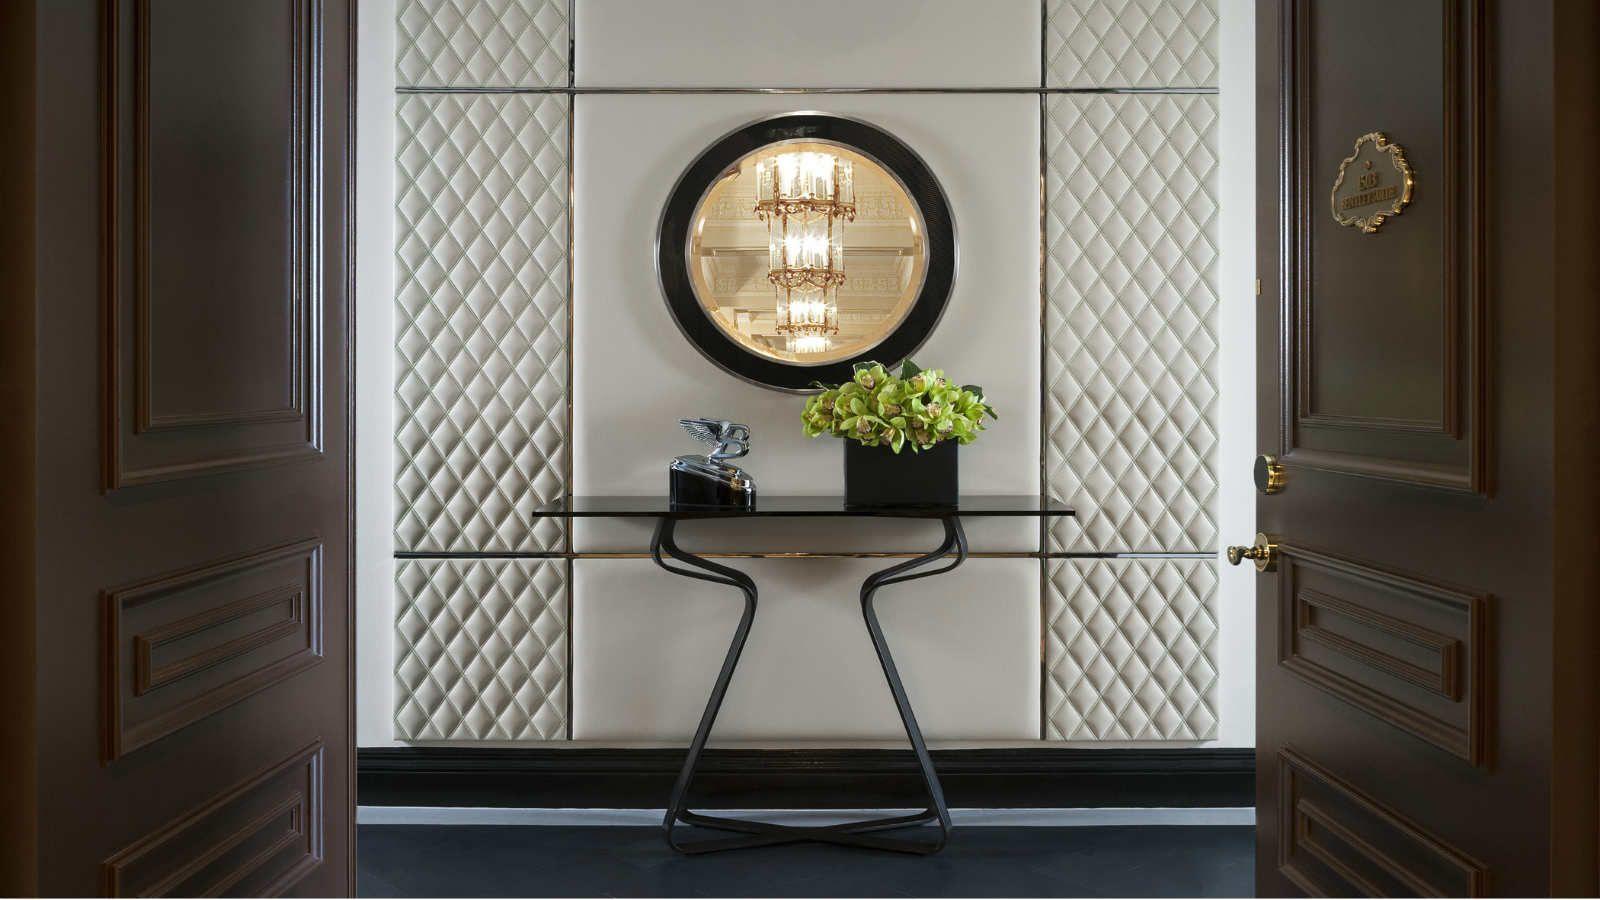 The st regis new york bentley suite entrance for Hotel foyer decor